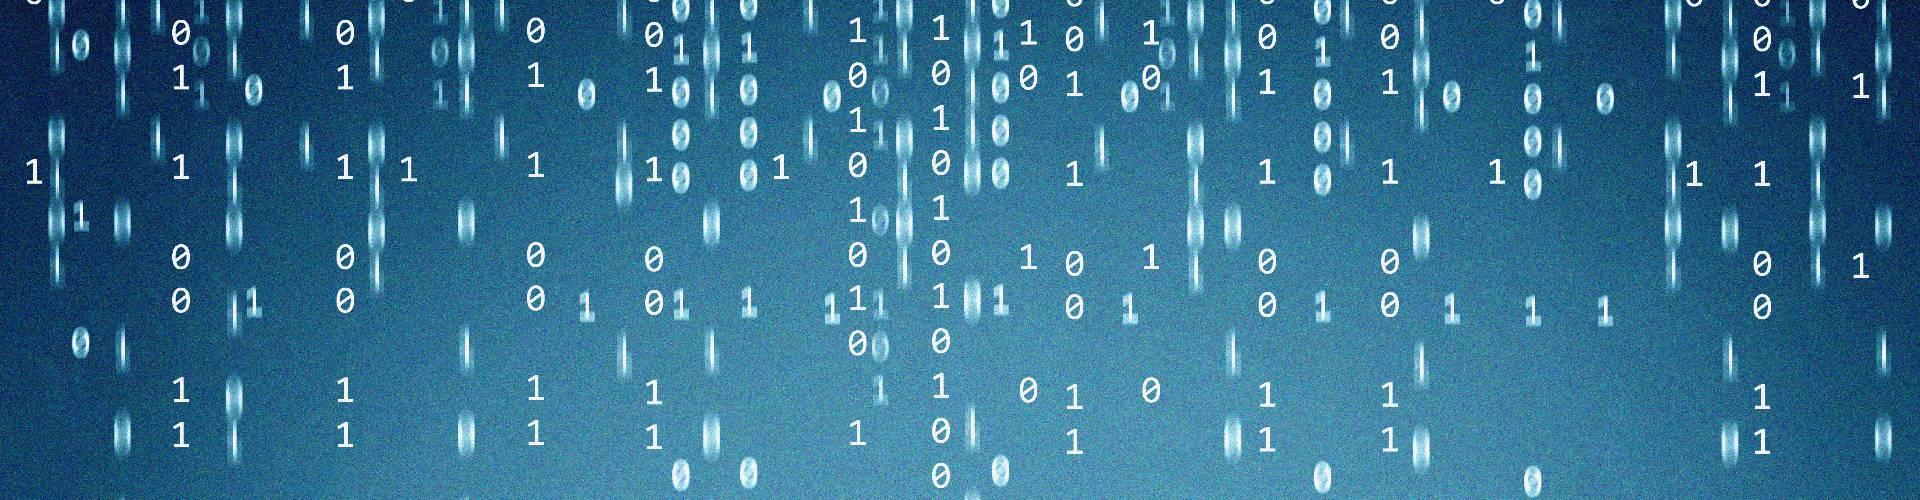 Dofoil Downloader Update Adds XOR-, RC4-Based Encryption